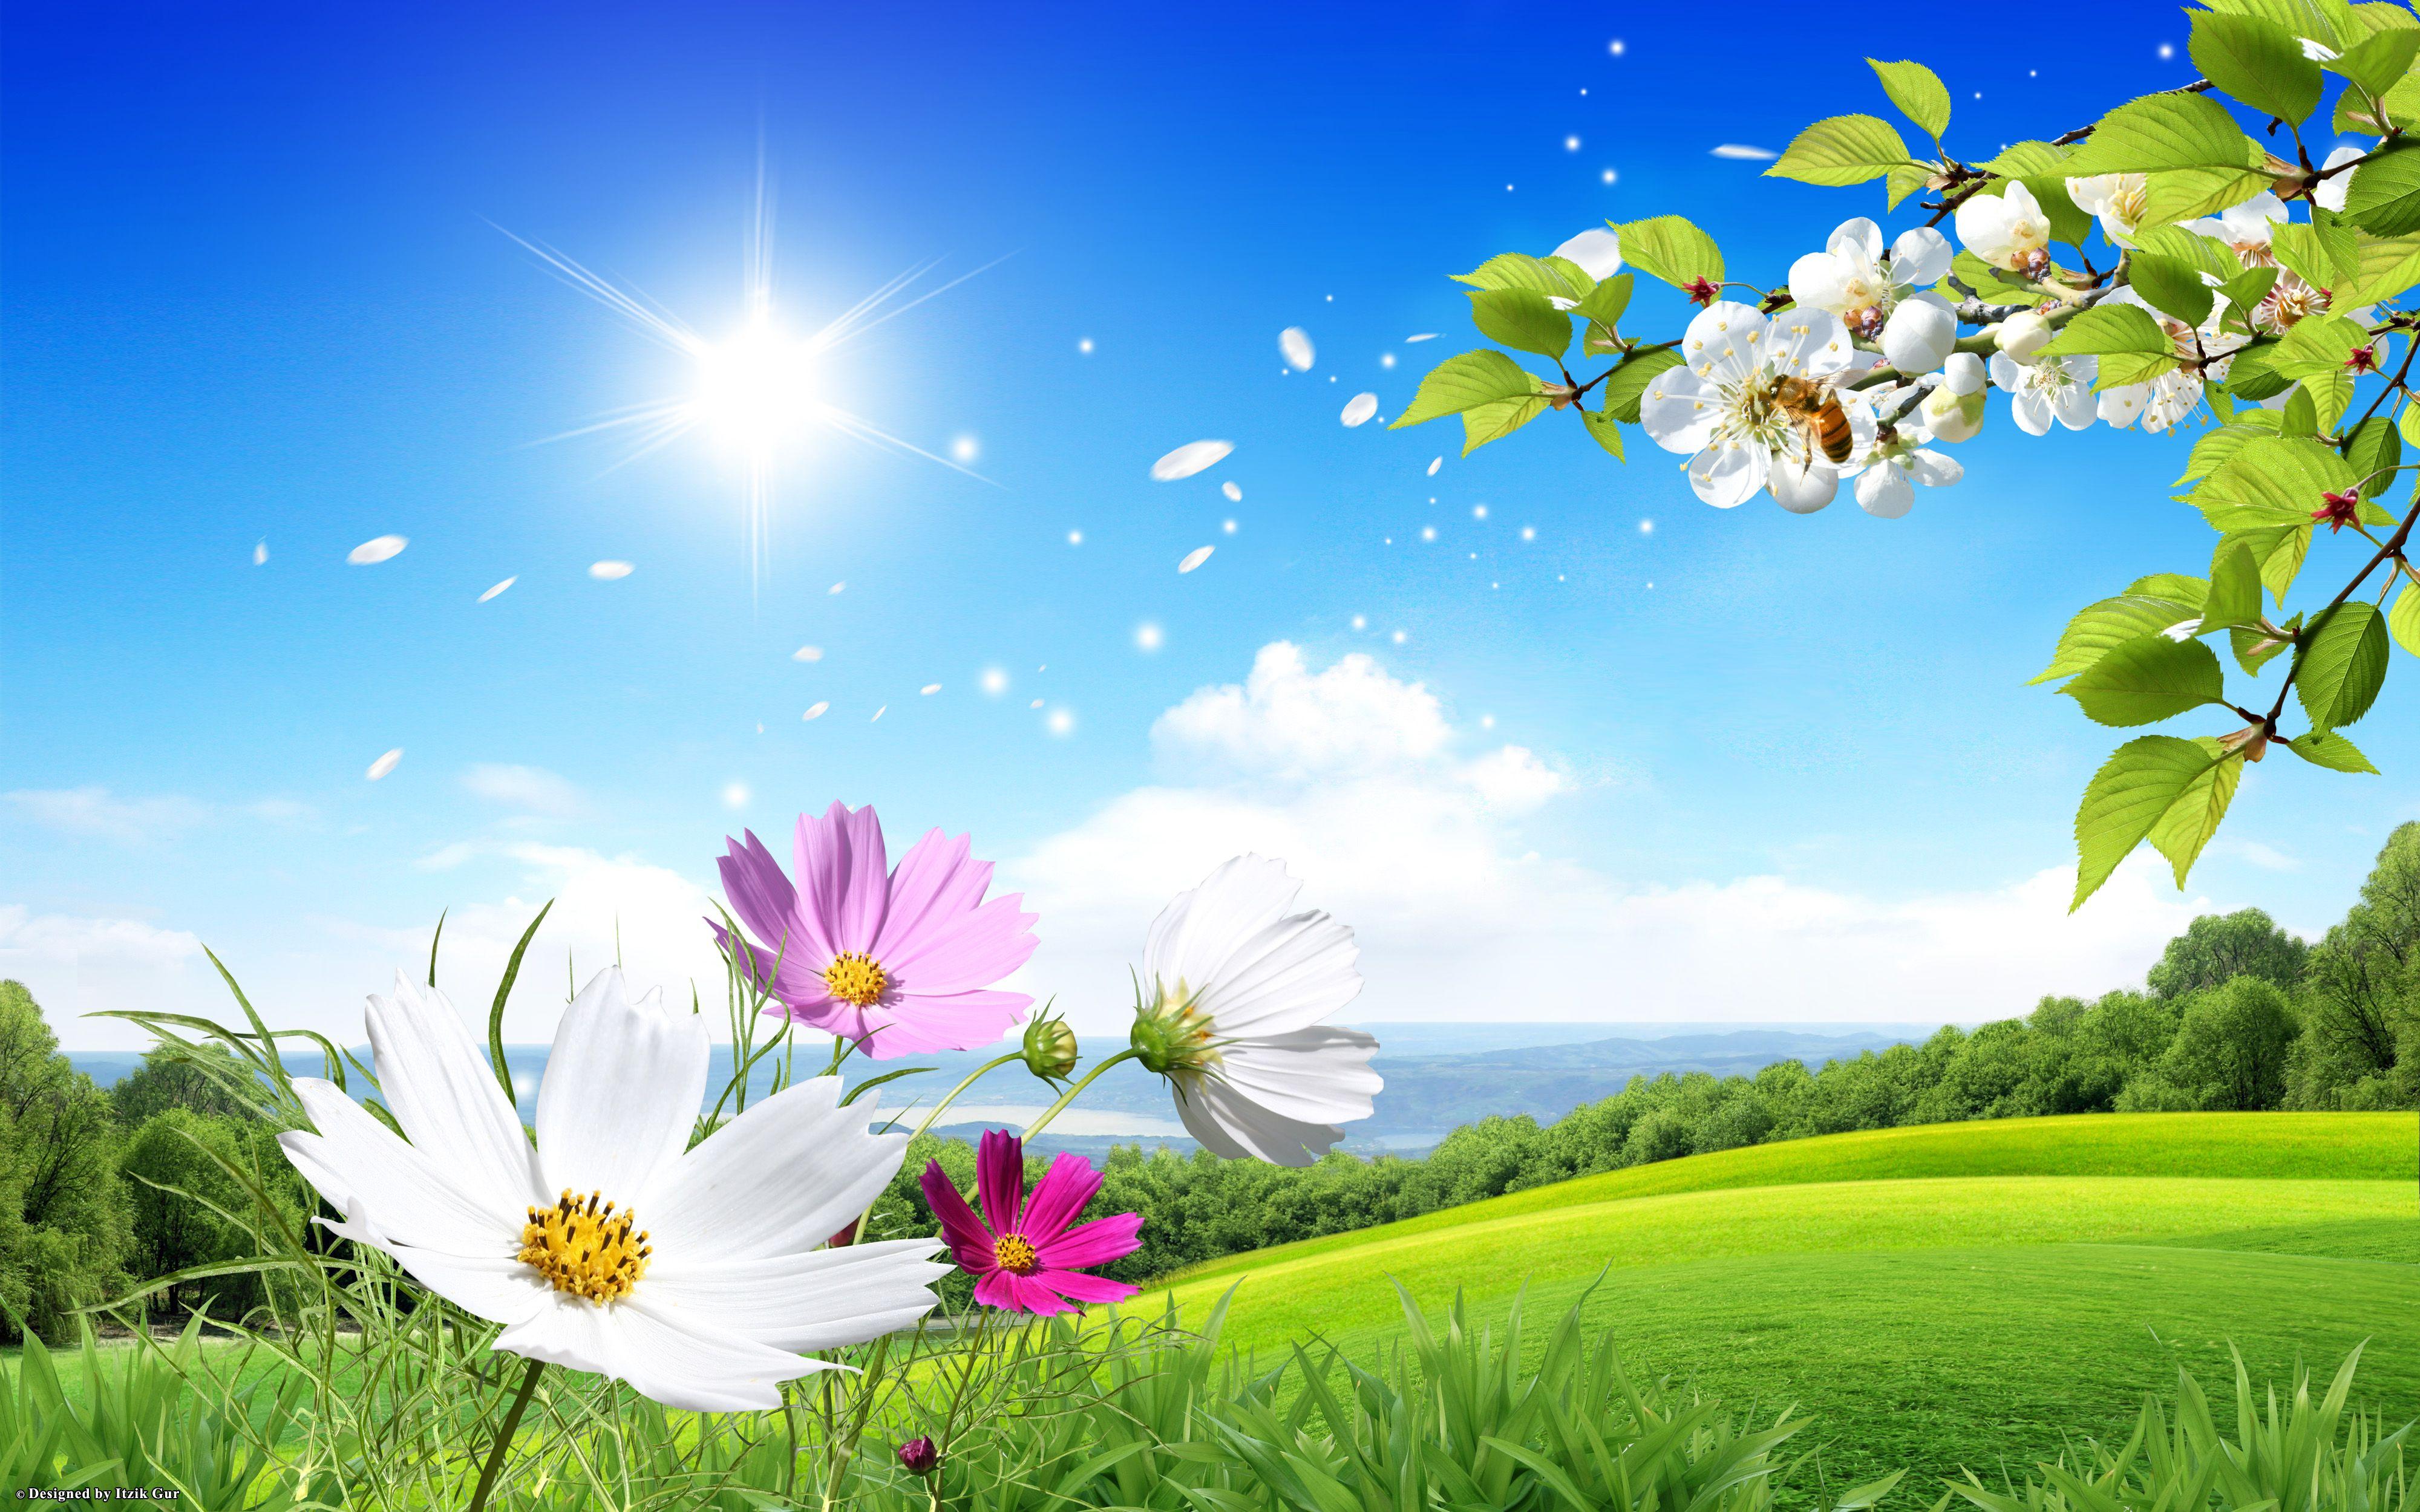 Hd wallpaper spring - Spring Wallpapers Best Wallpapers